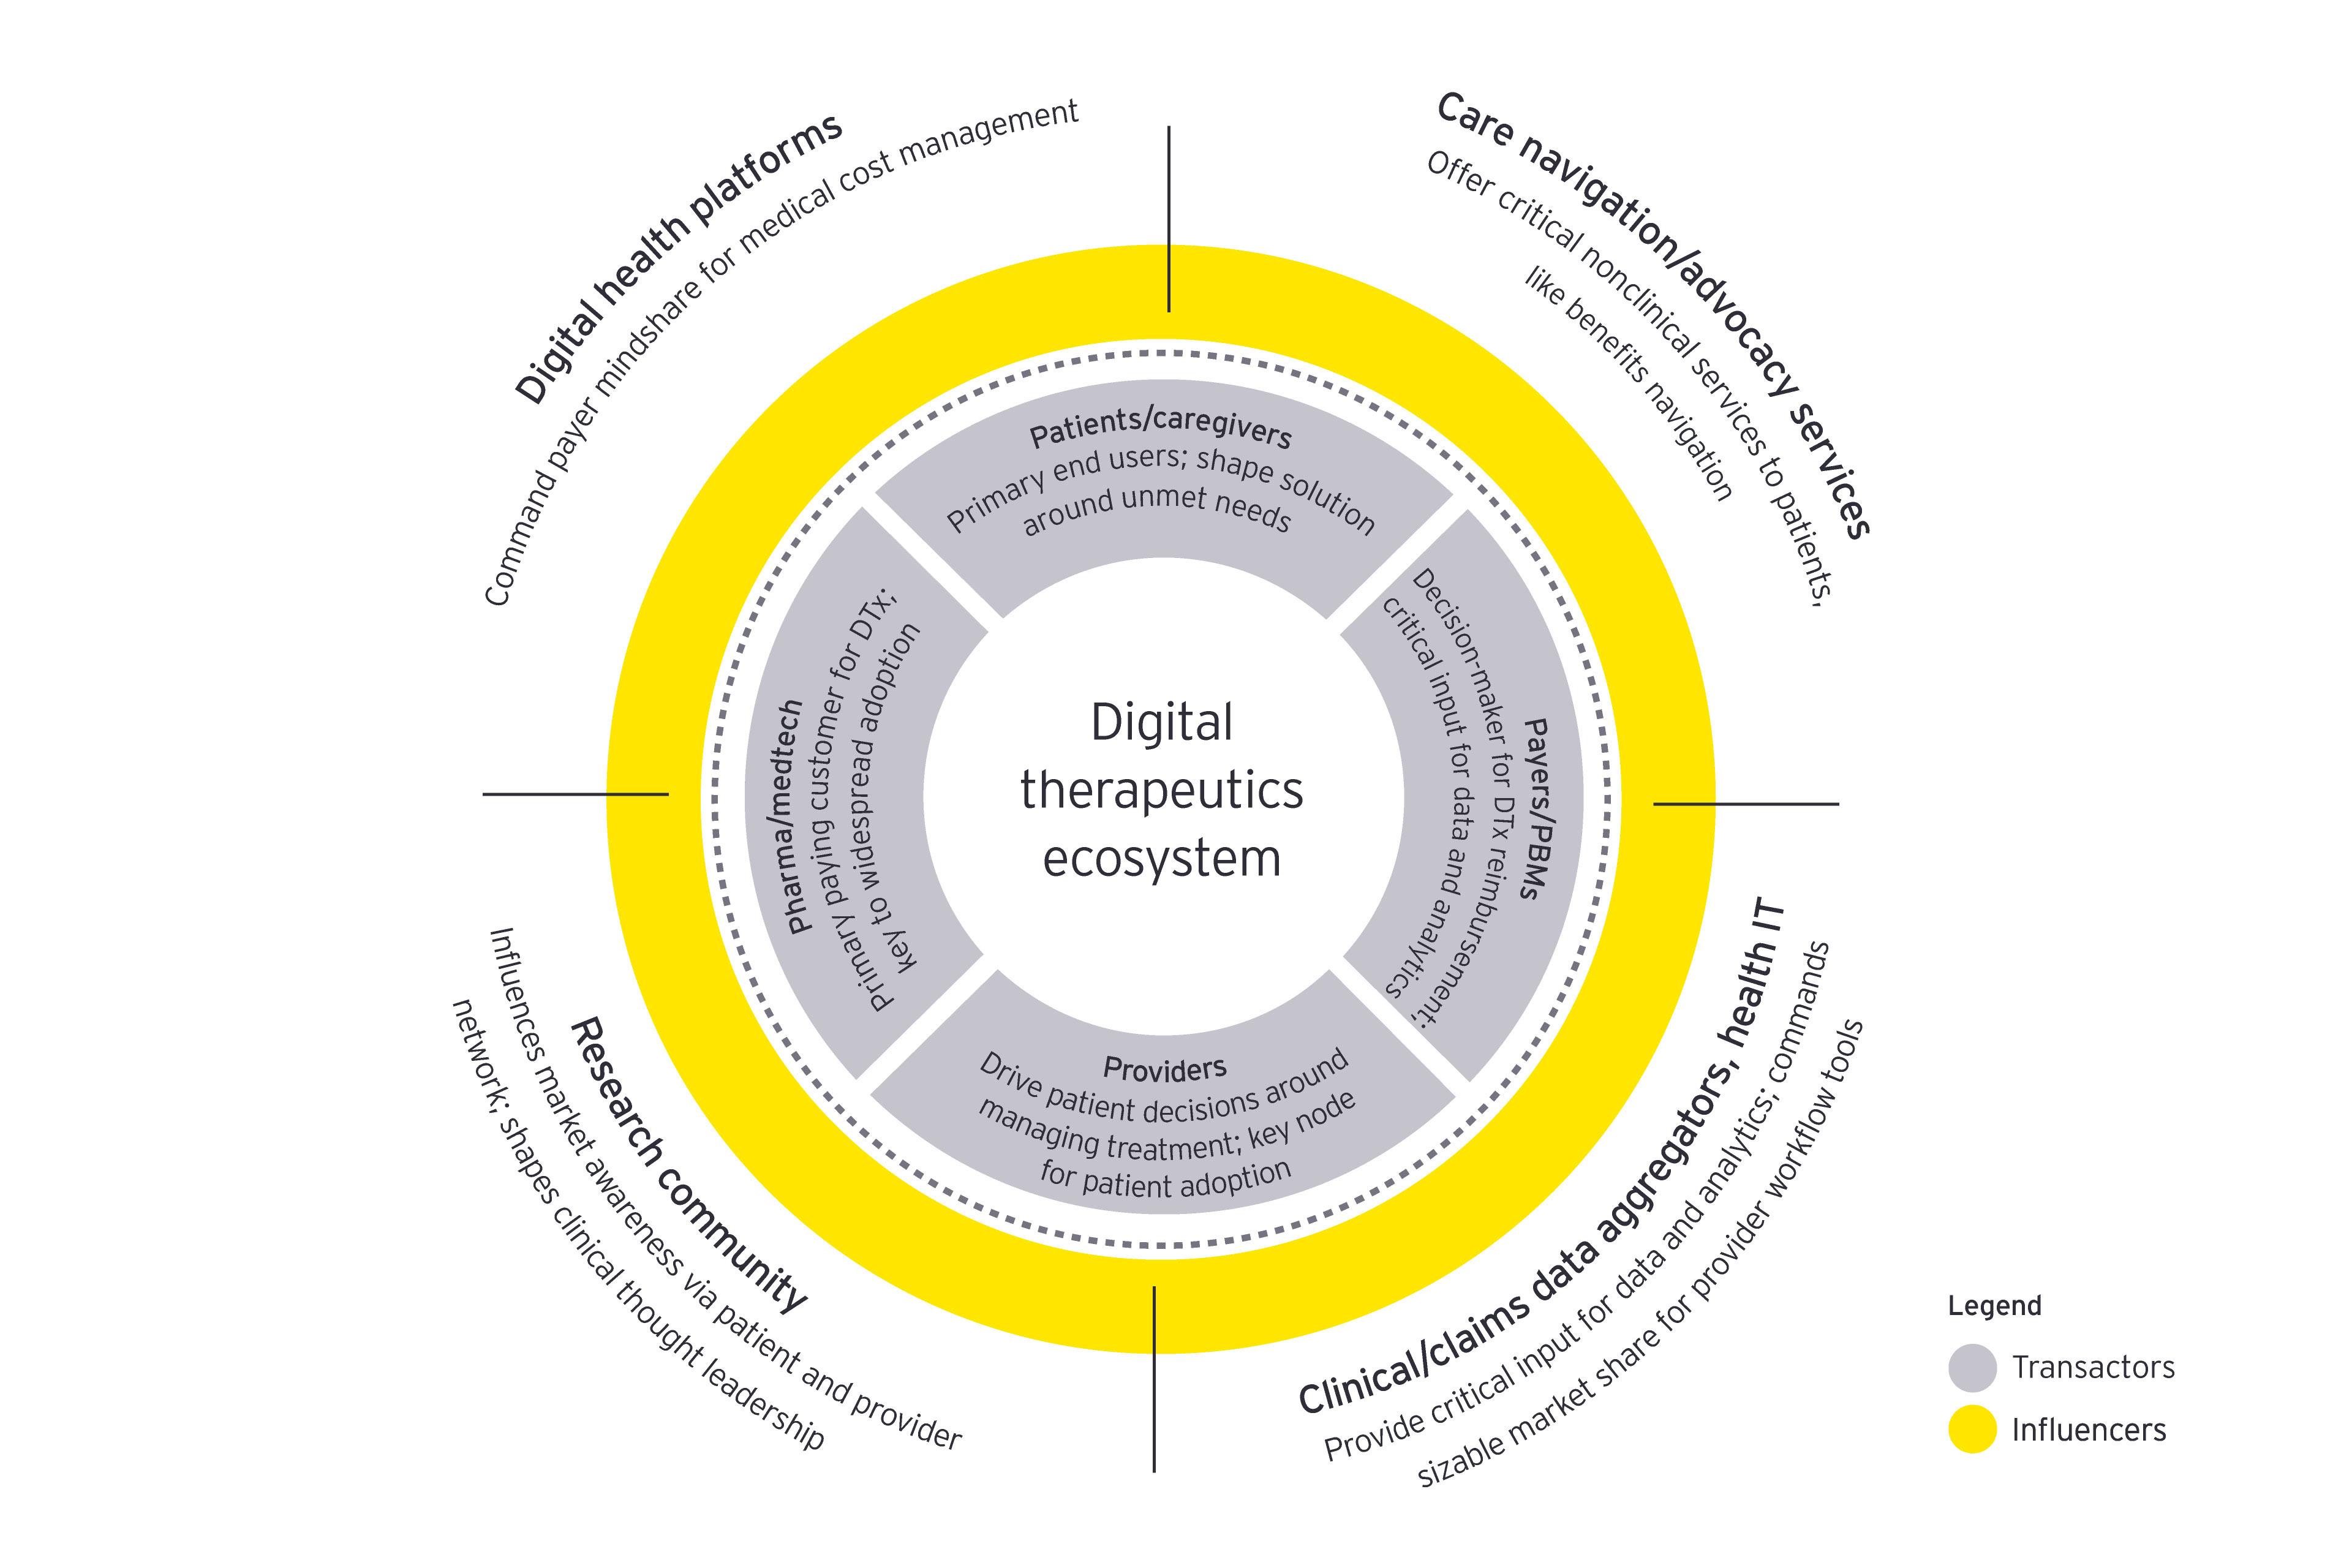 Digital therapeutics ecosystem